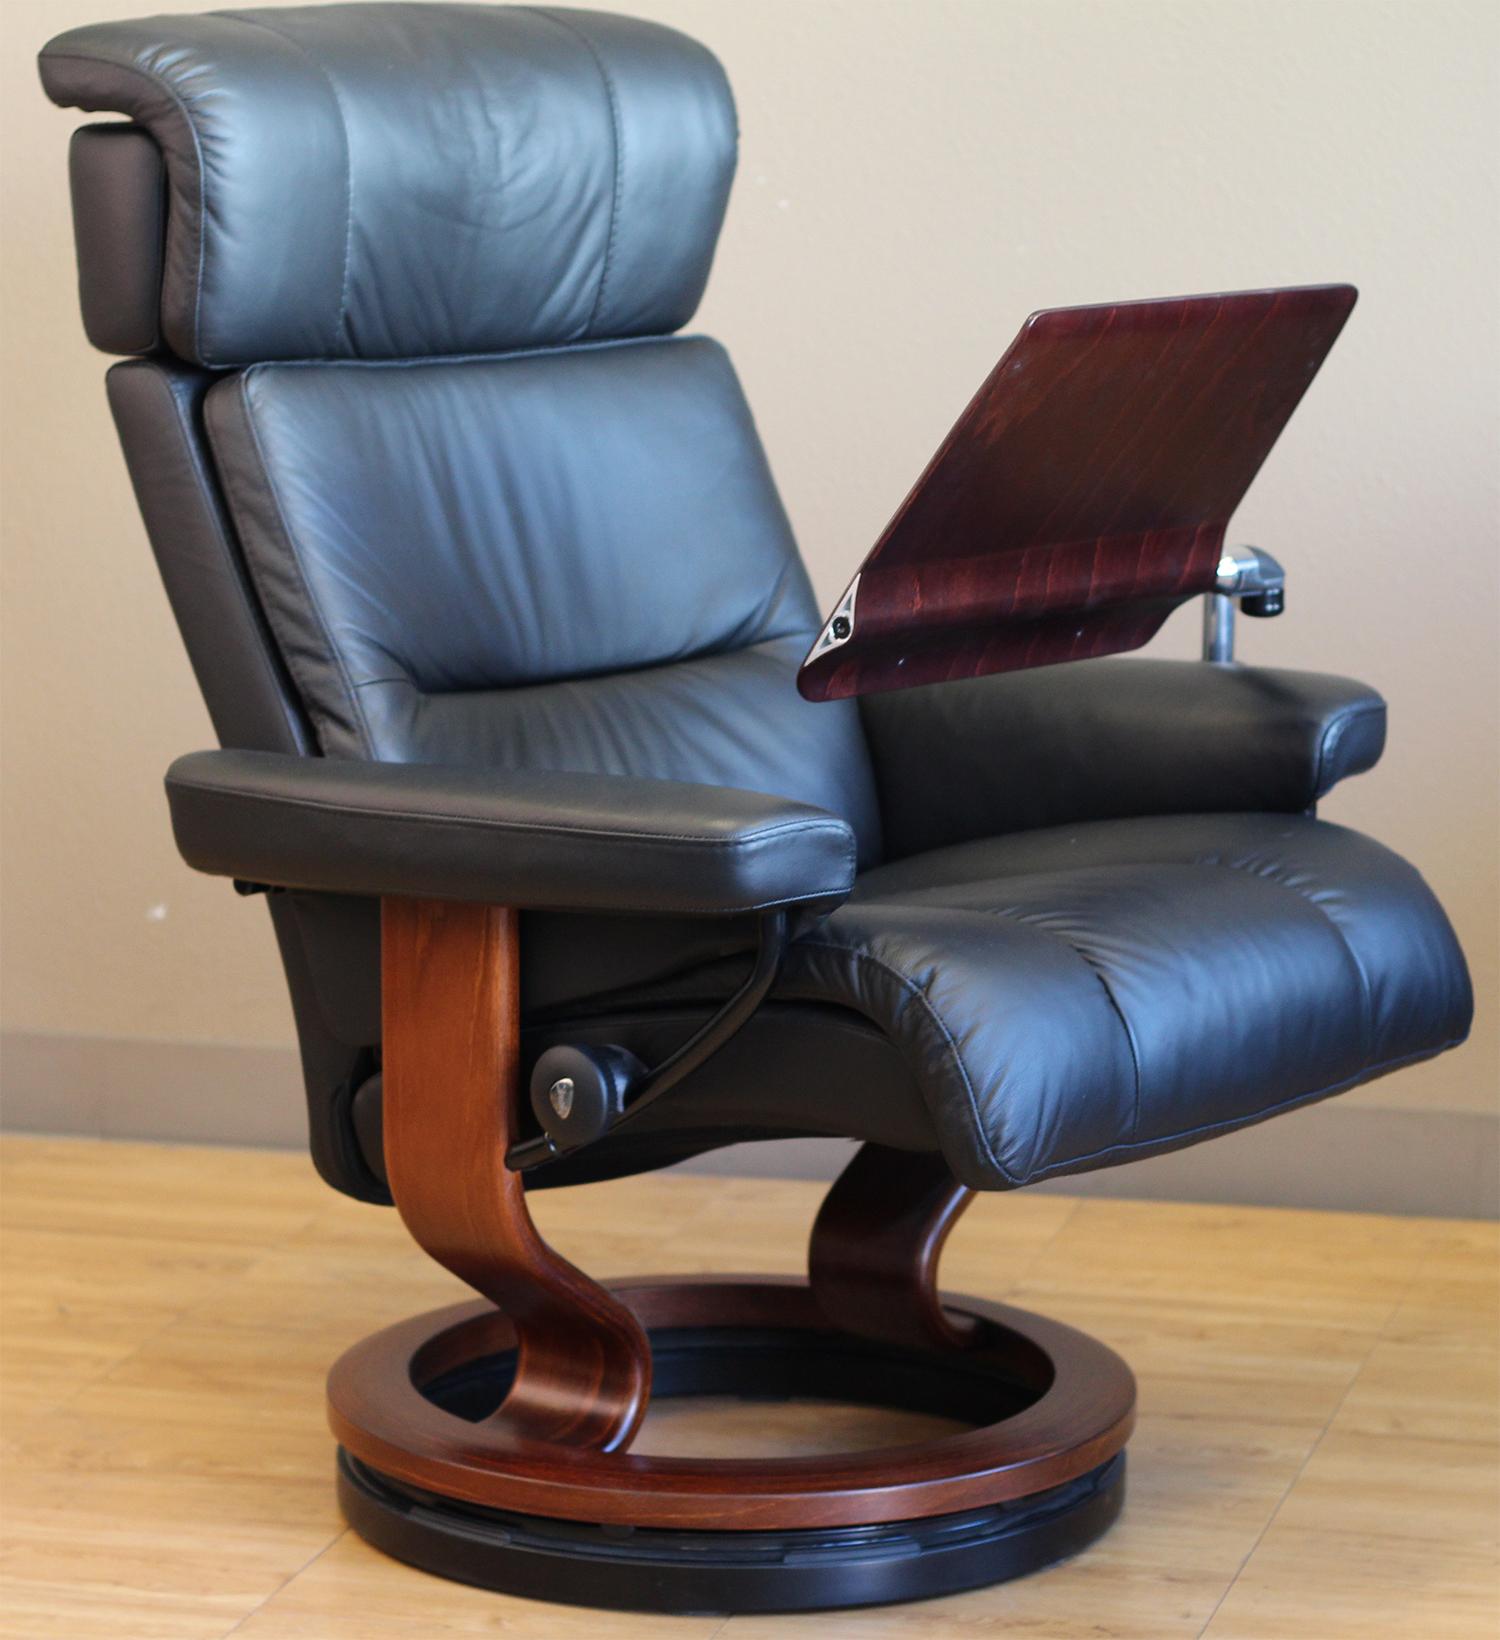 Remarkable Stressless Recliner Chair Elevator Ring Theyellowbook Wood Chair Design Ideas Theyellowbookinfo